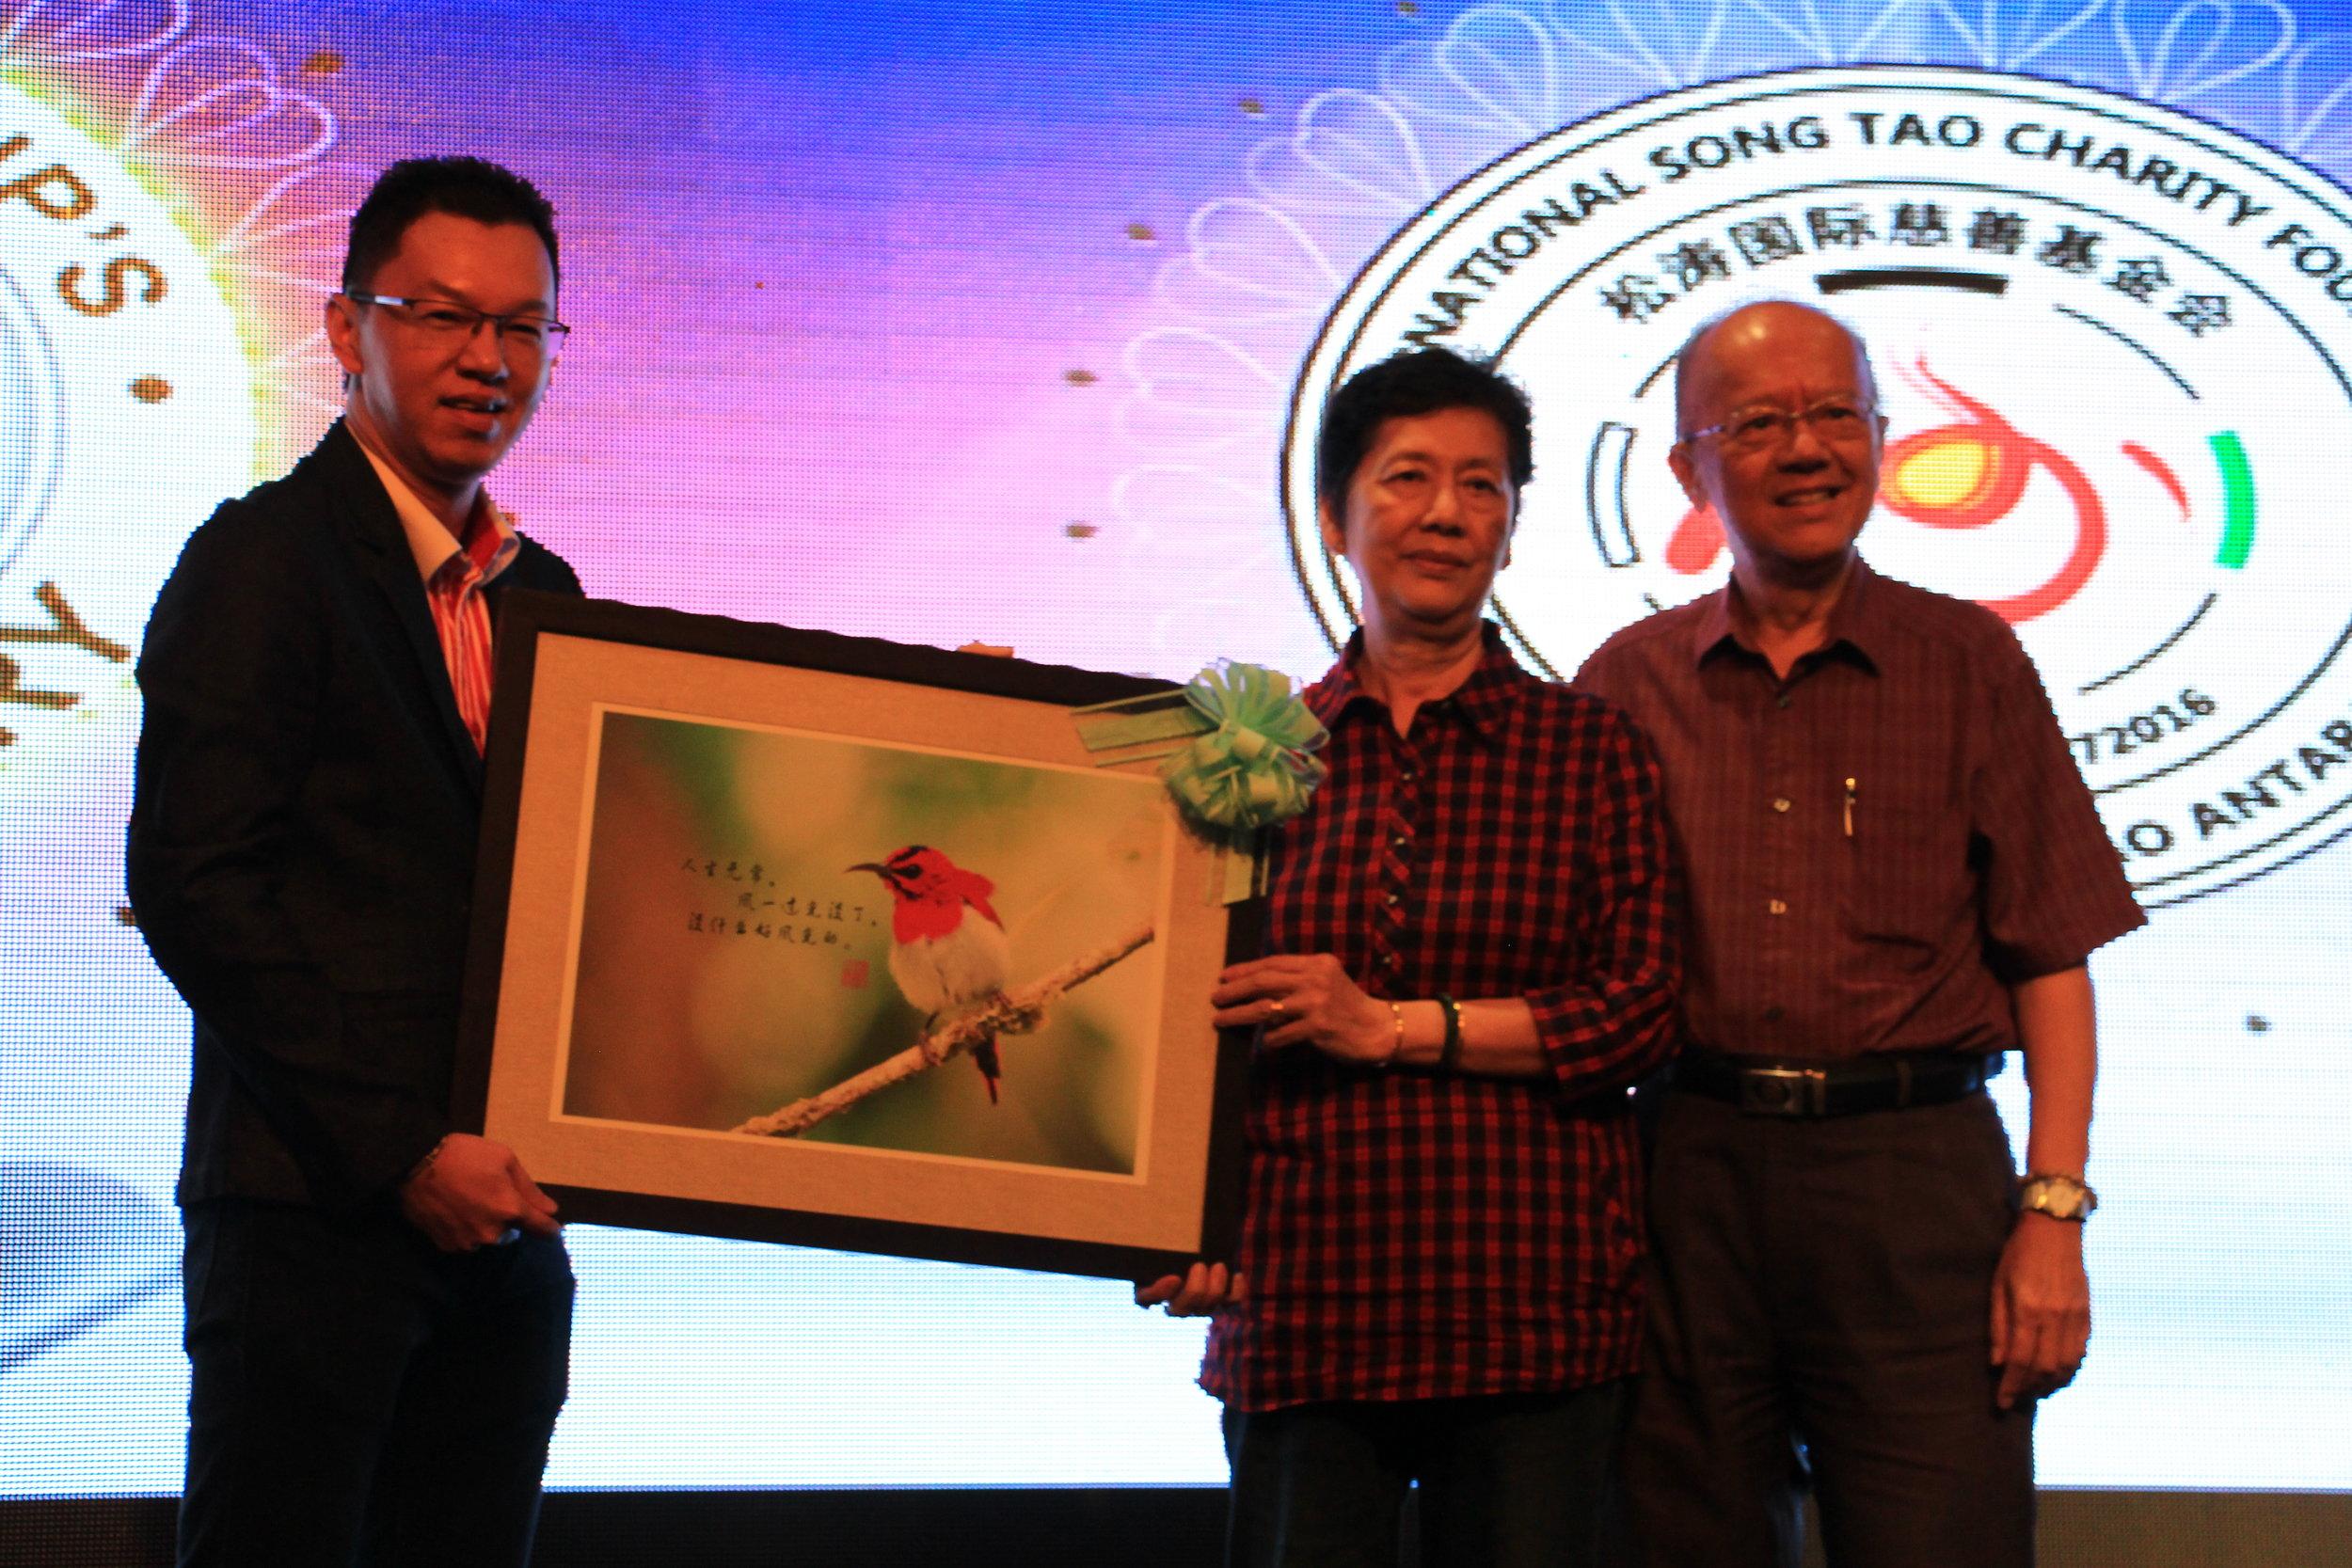 21st Anniversary on 10/11/2017 - international song tao charity foundation